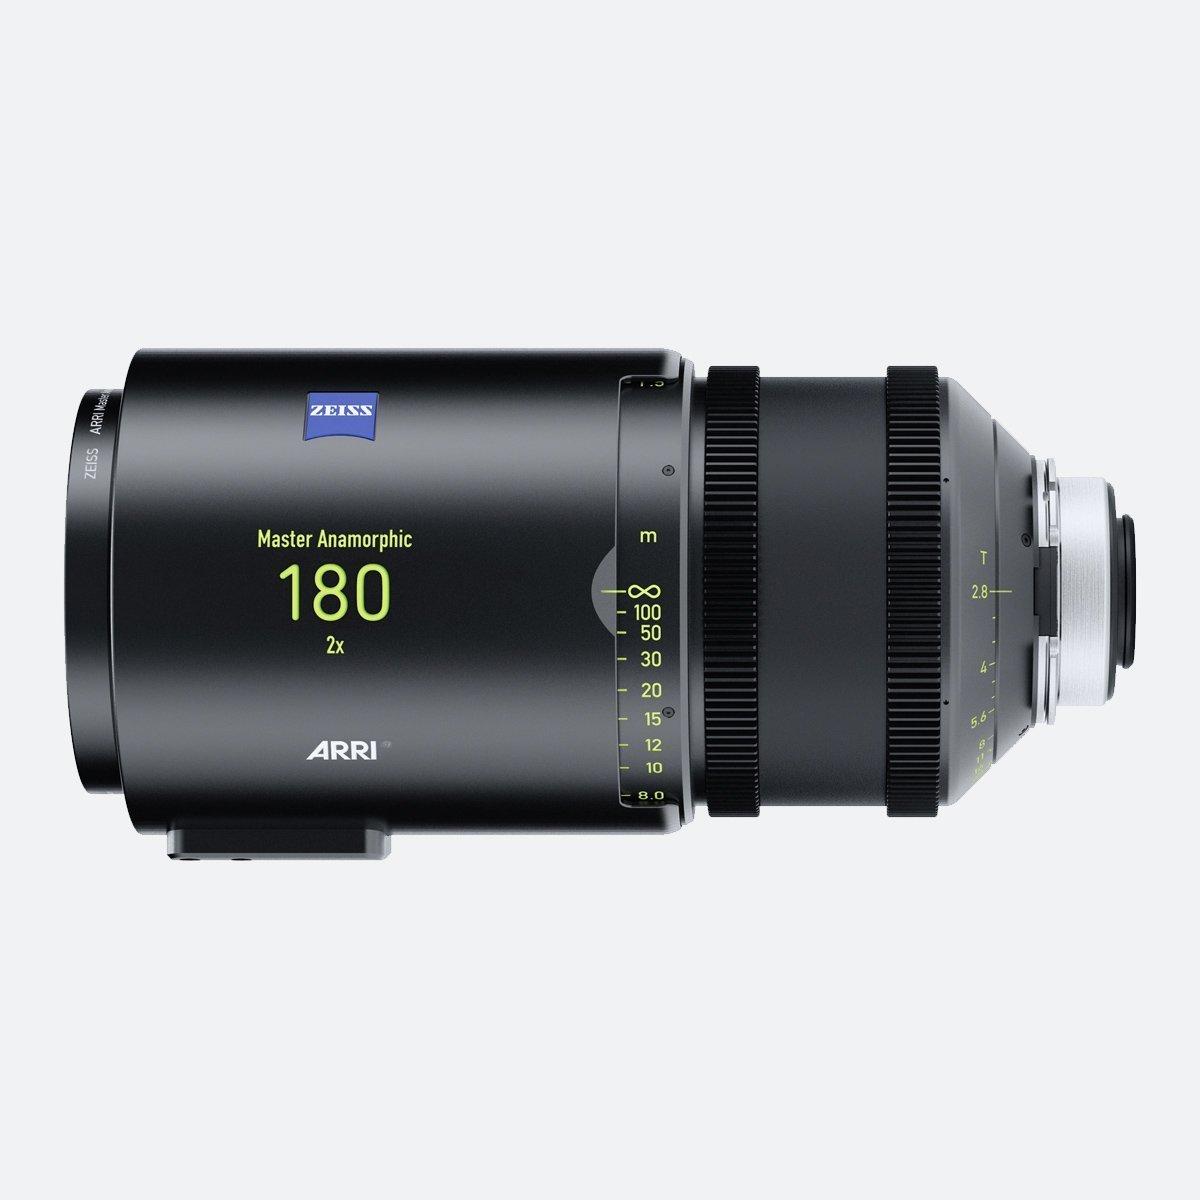 ARRI 180mm T1.9 Master Anamorphic Lens